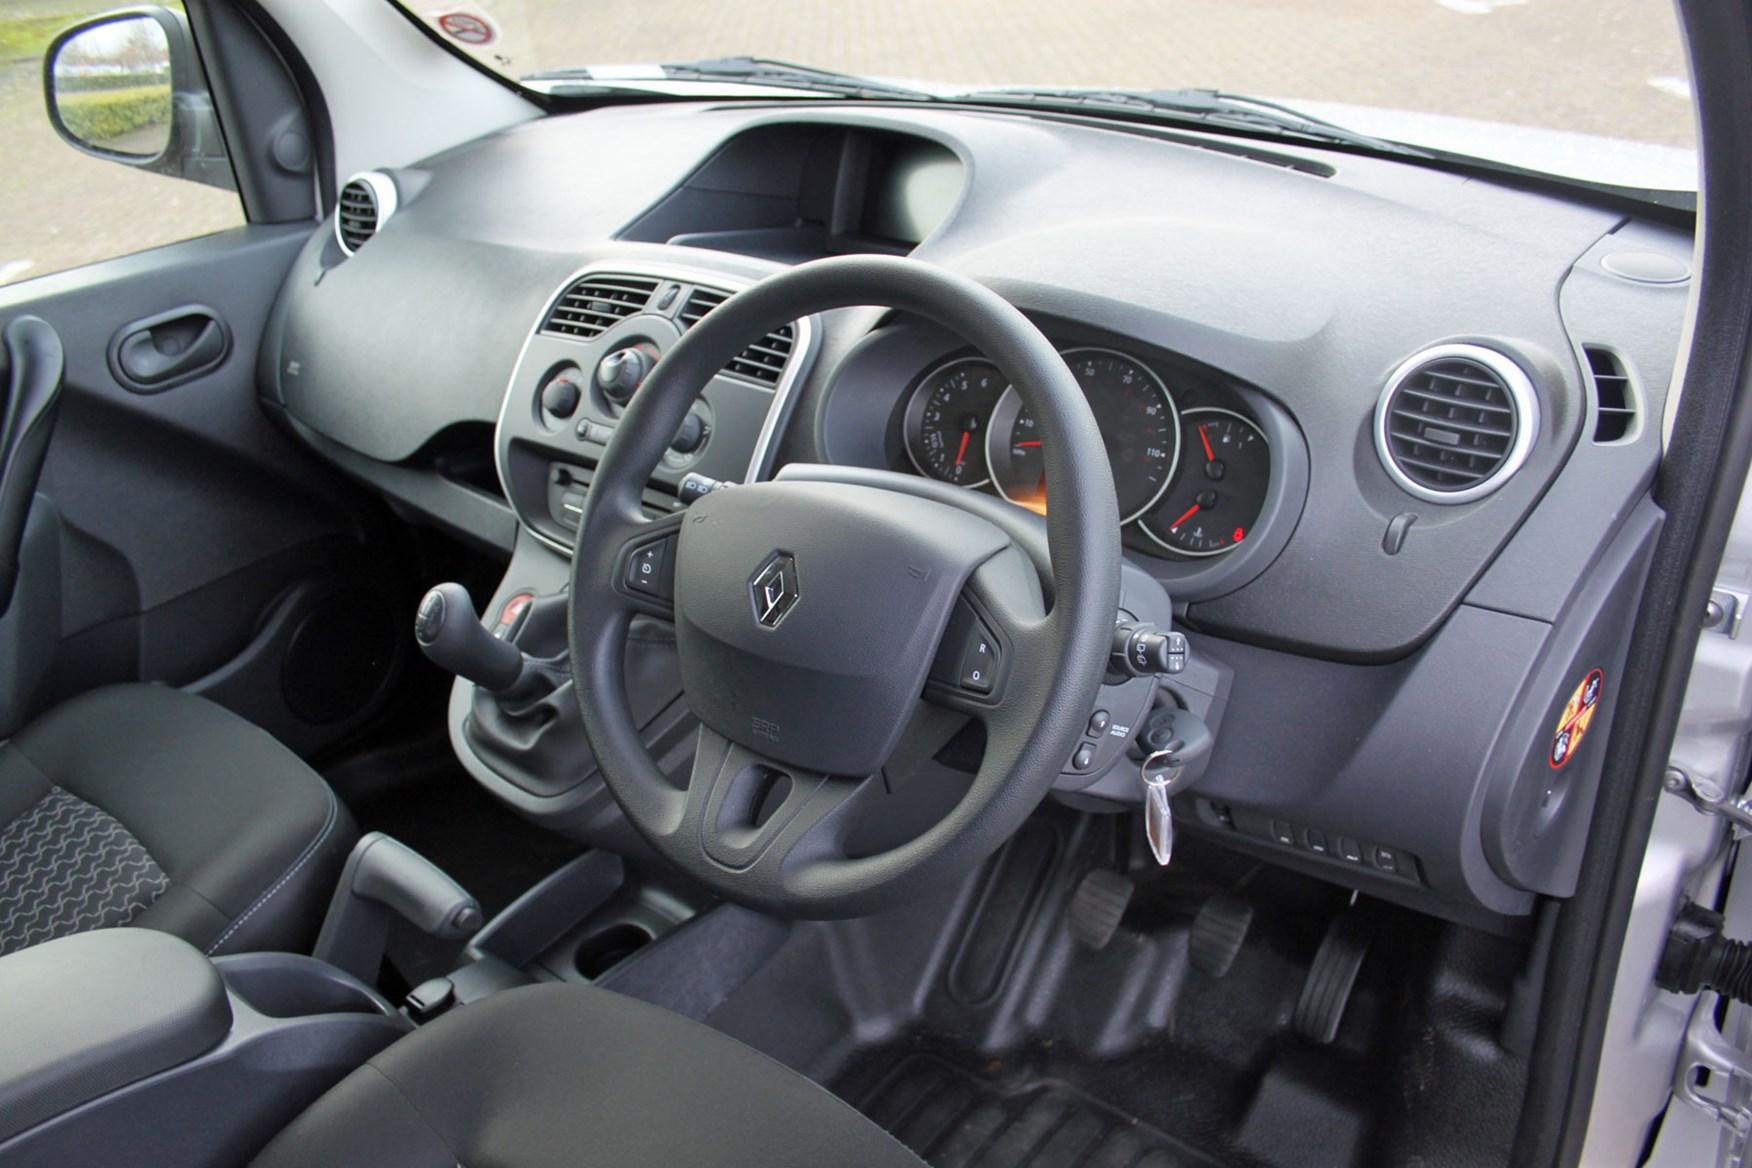 Renault Kangoo Sport review - cab interior